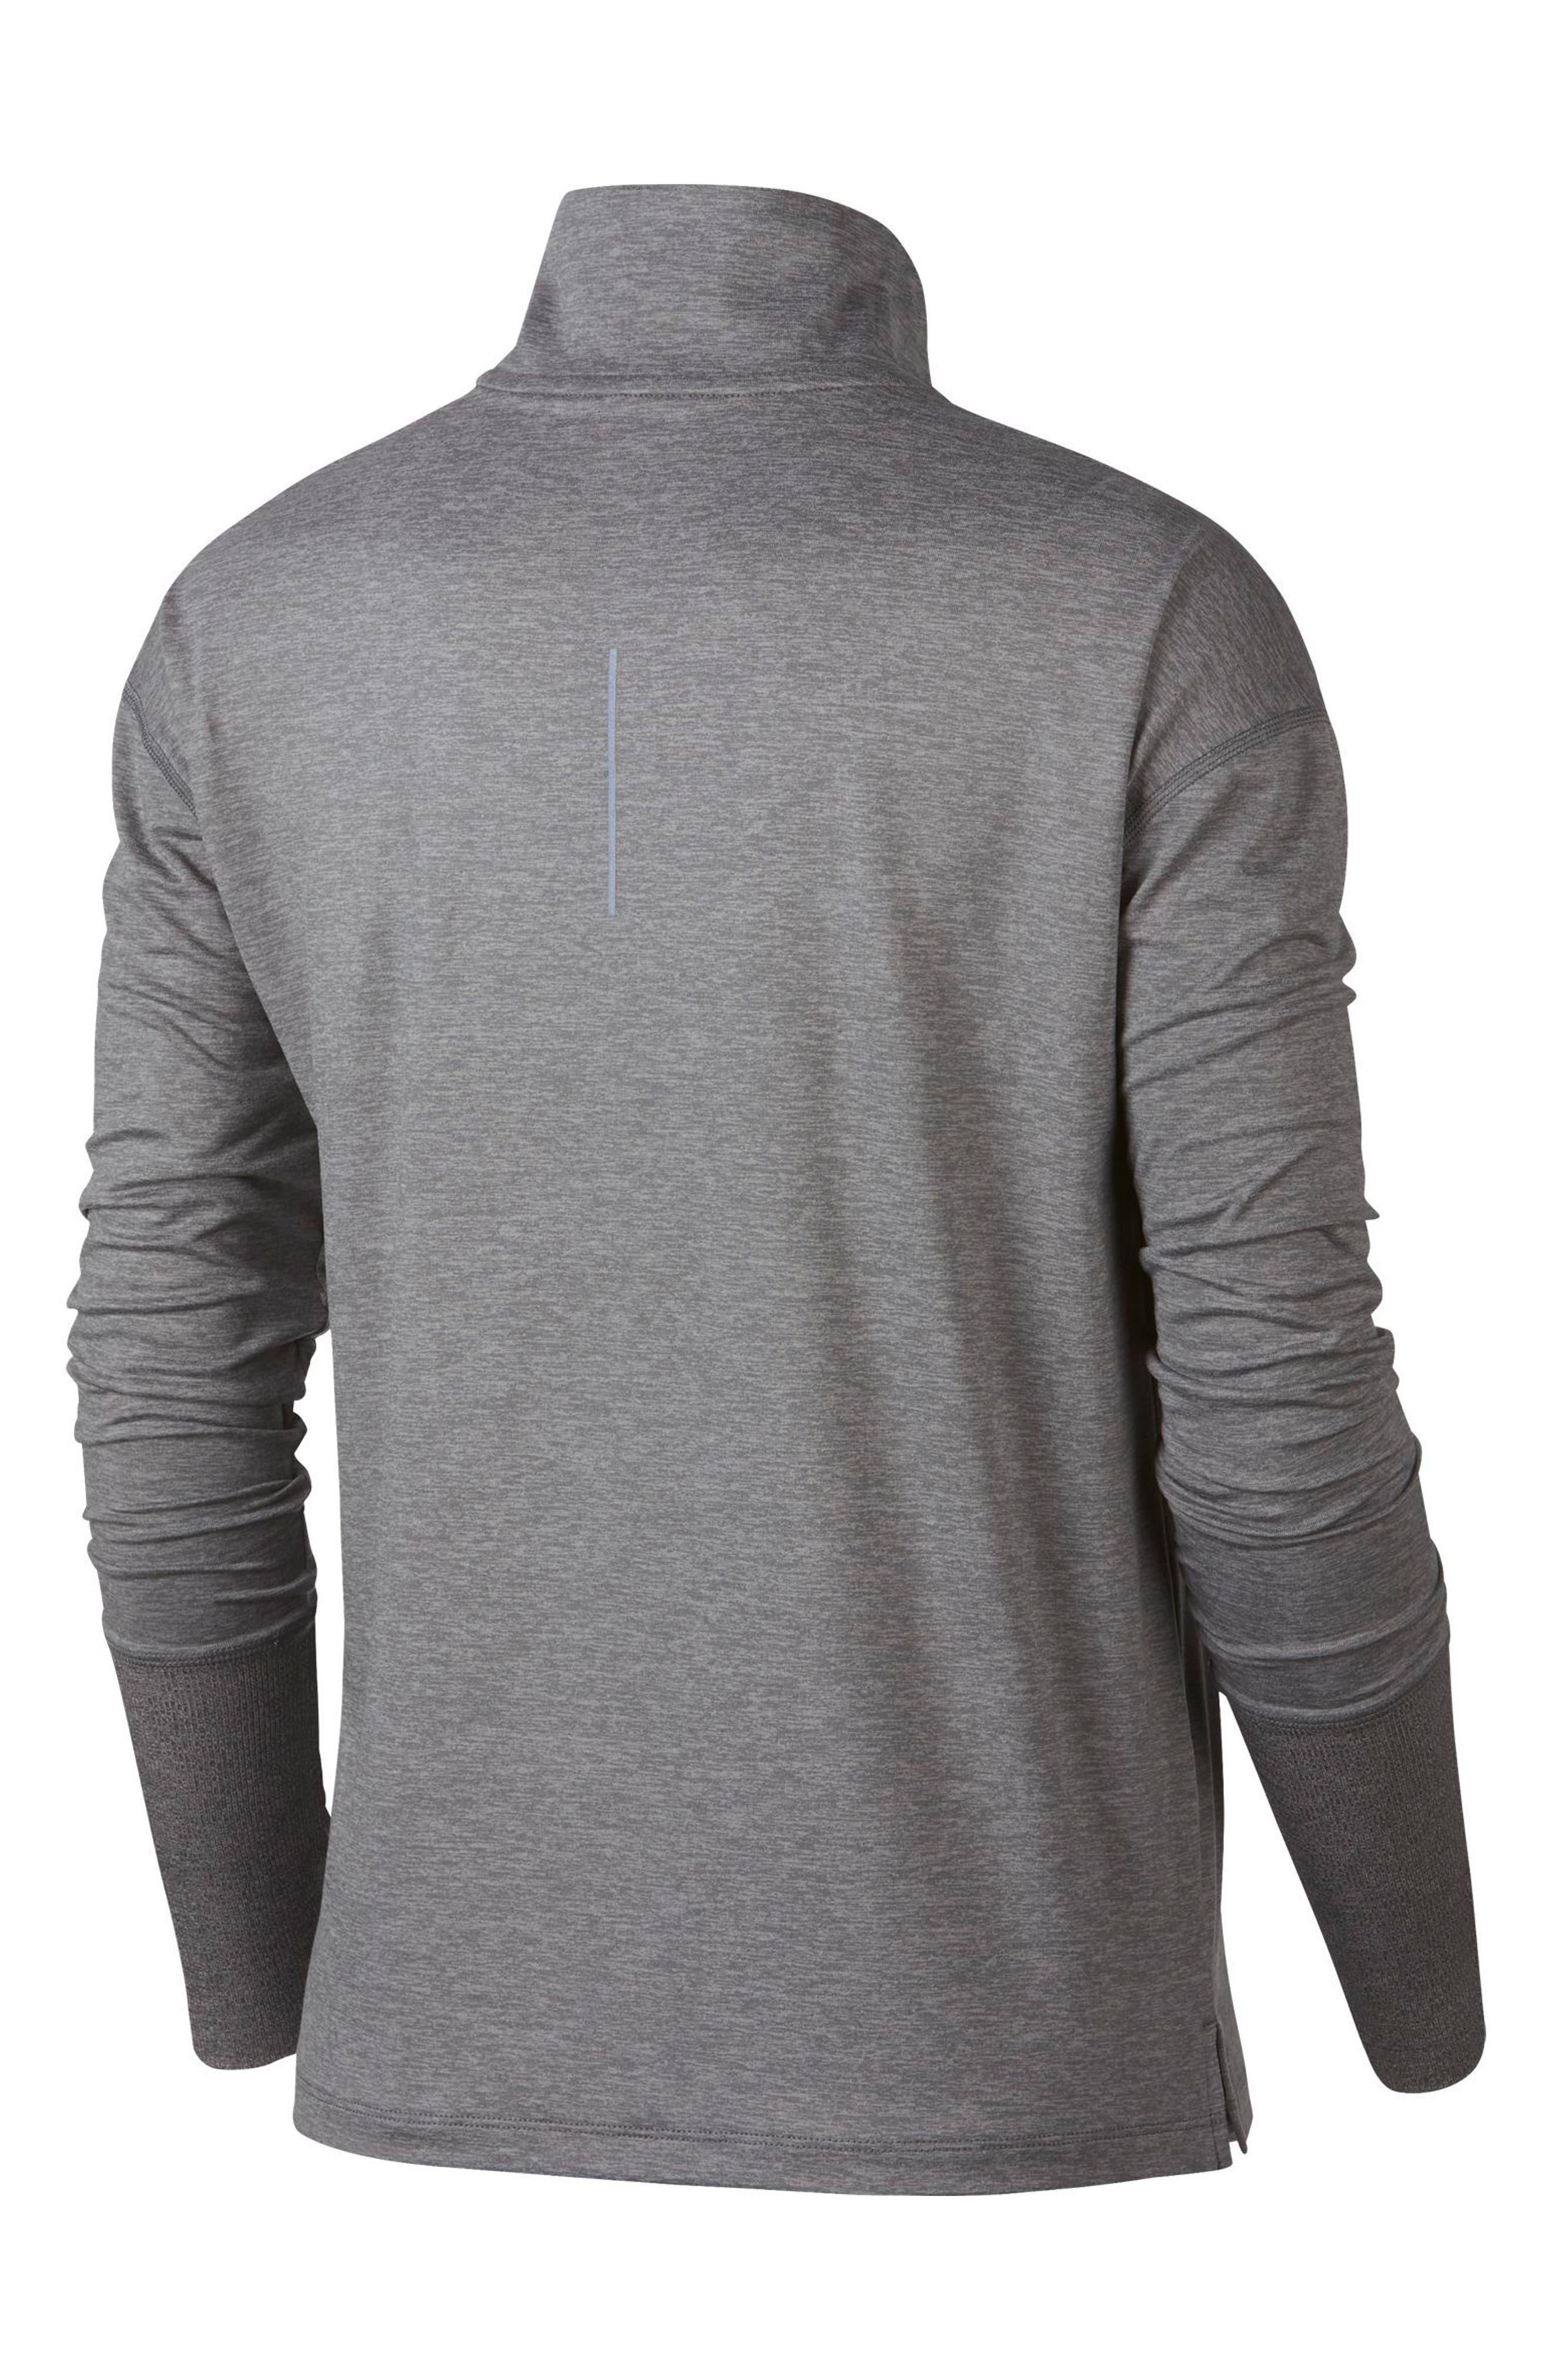 a04a89cd31fd Women s Nike Sweatshirts   Hoodies